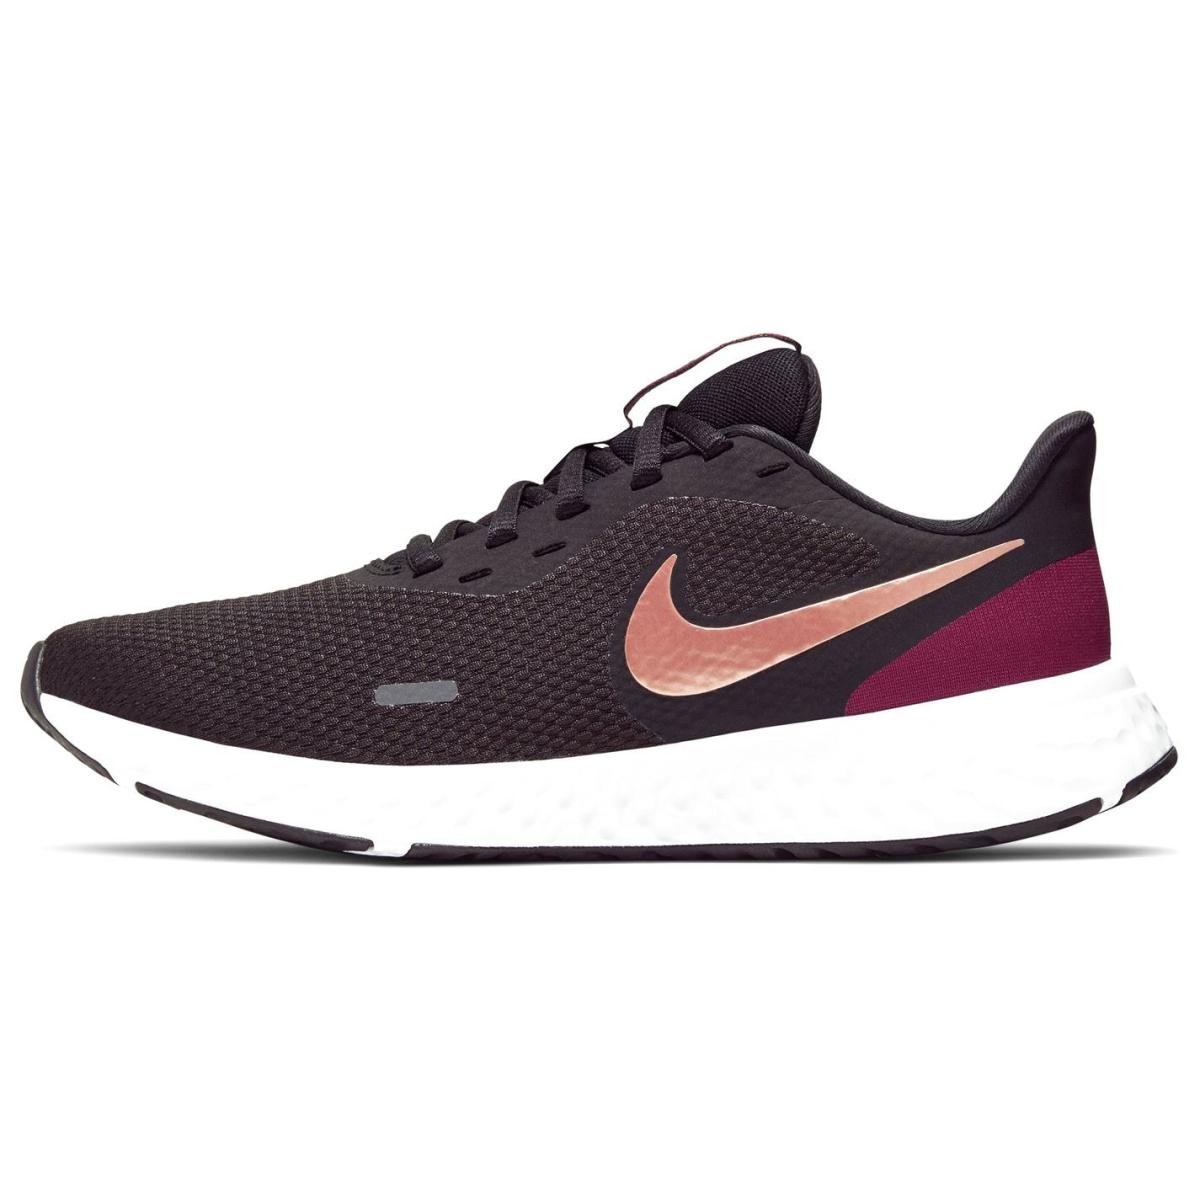 Nike-Revolution-Turnschuhe-Damen-Sneaker-Sportschuhe-Laufschuhe-1160 Indexbild 6